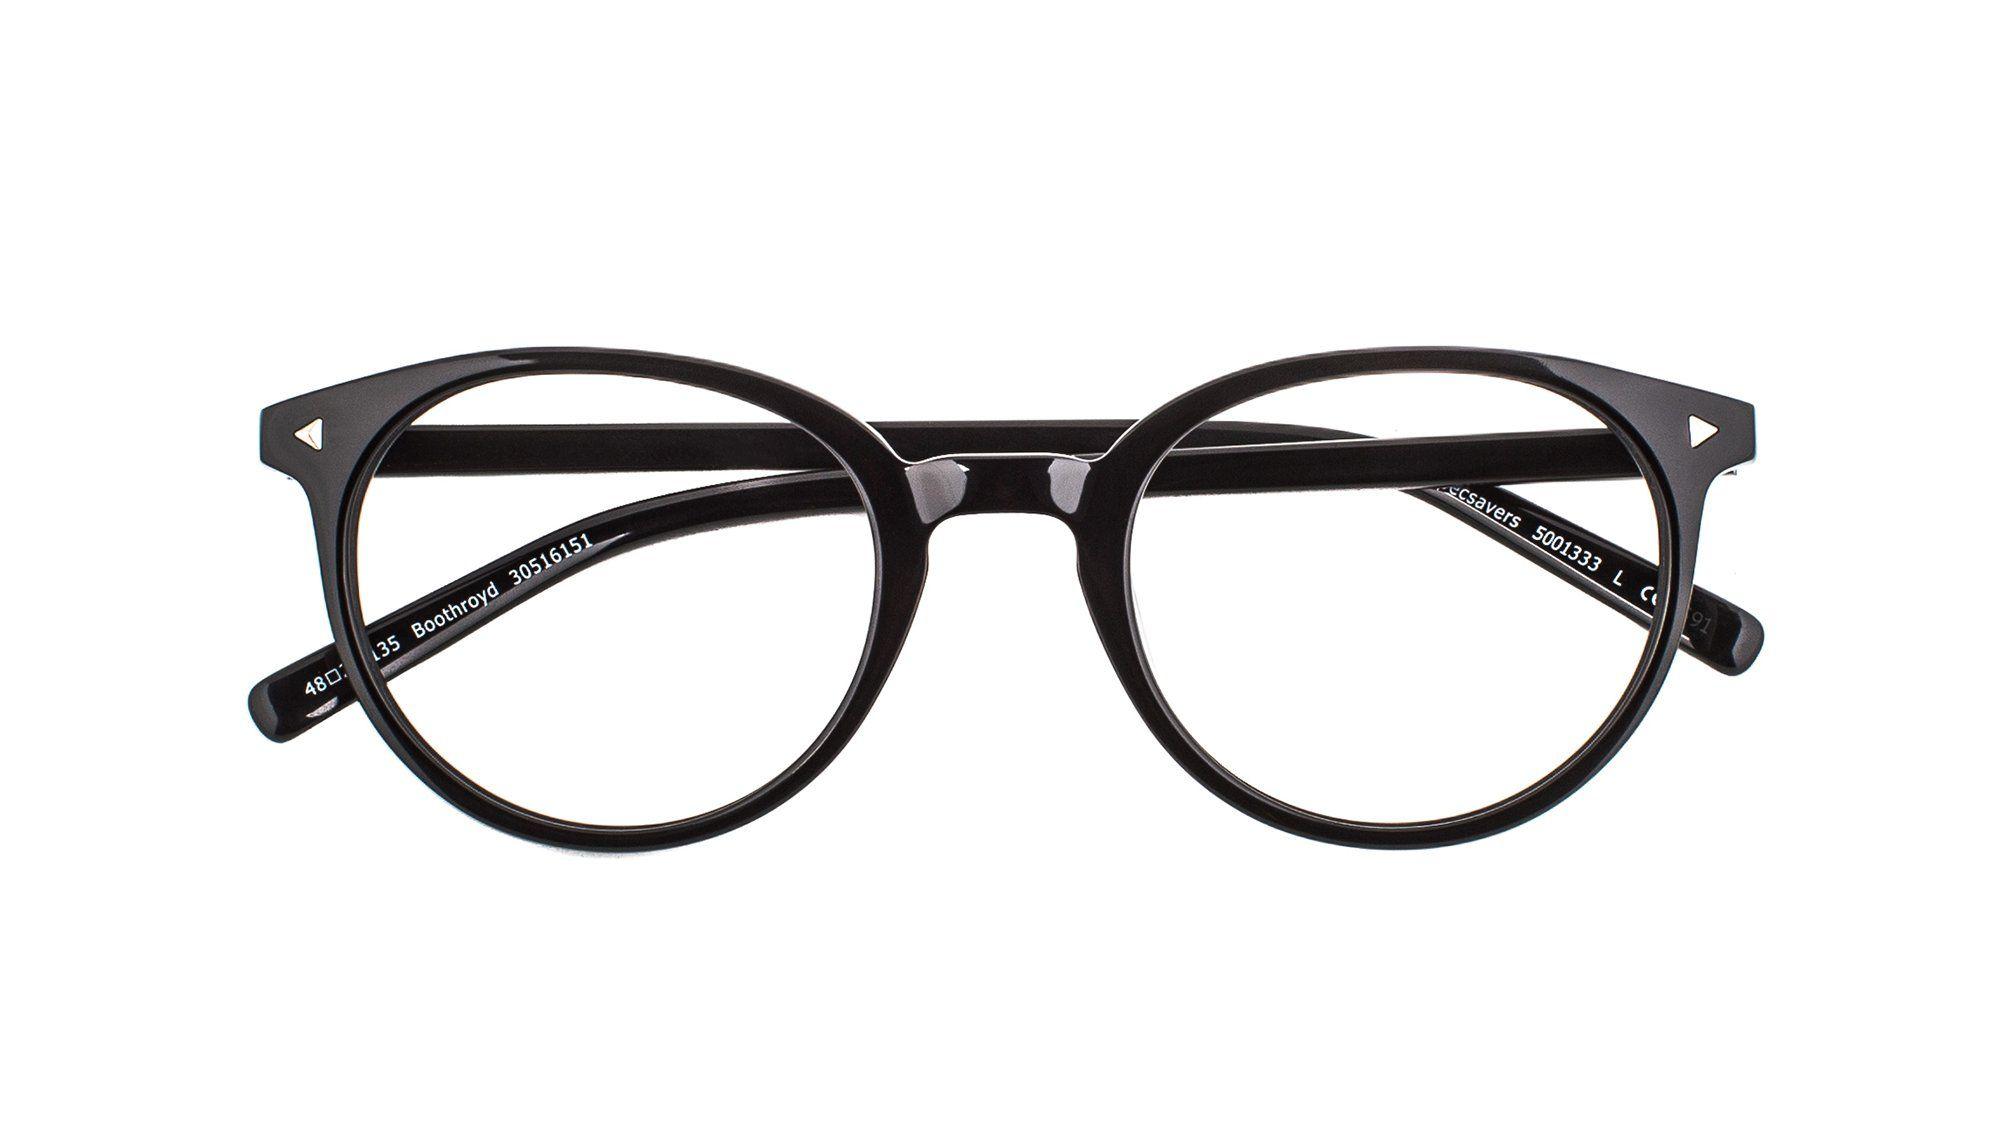 51581bfc75b Specsavers glasses - BOOTHROYD Womens Glasses